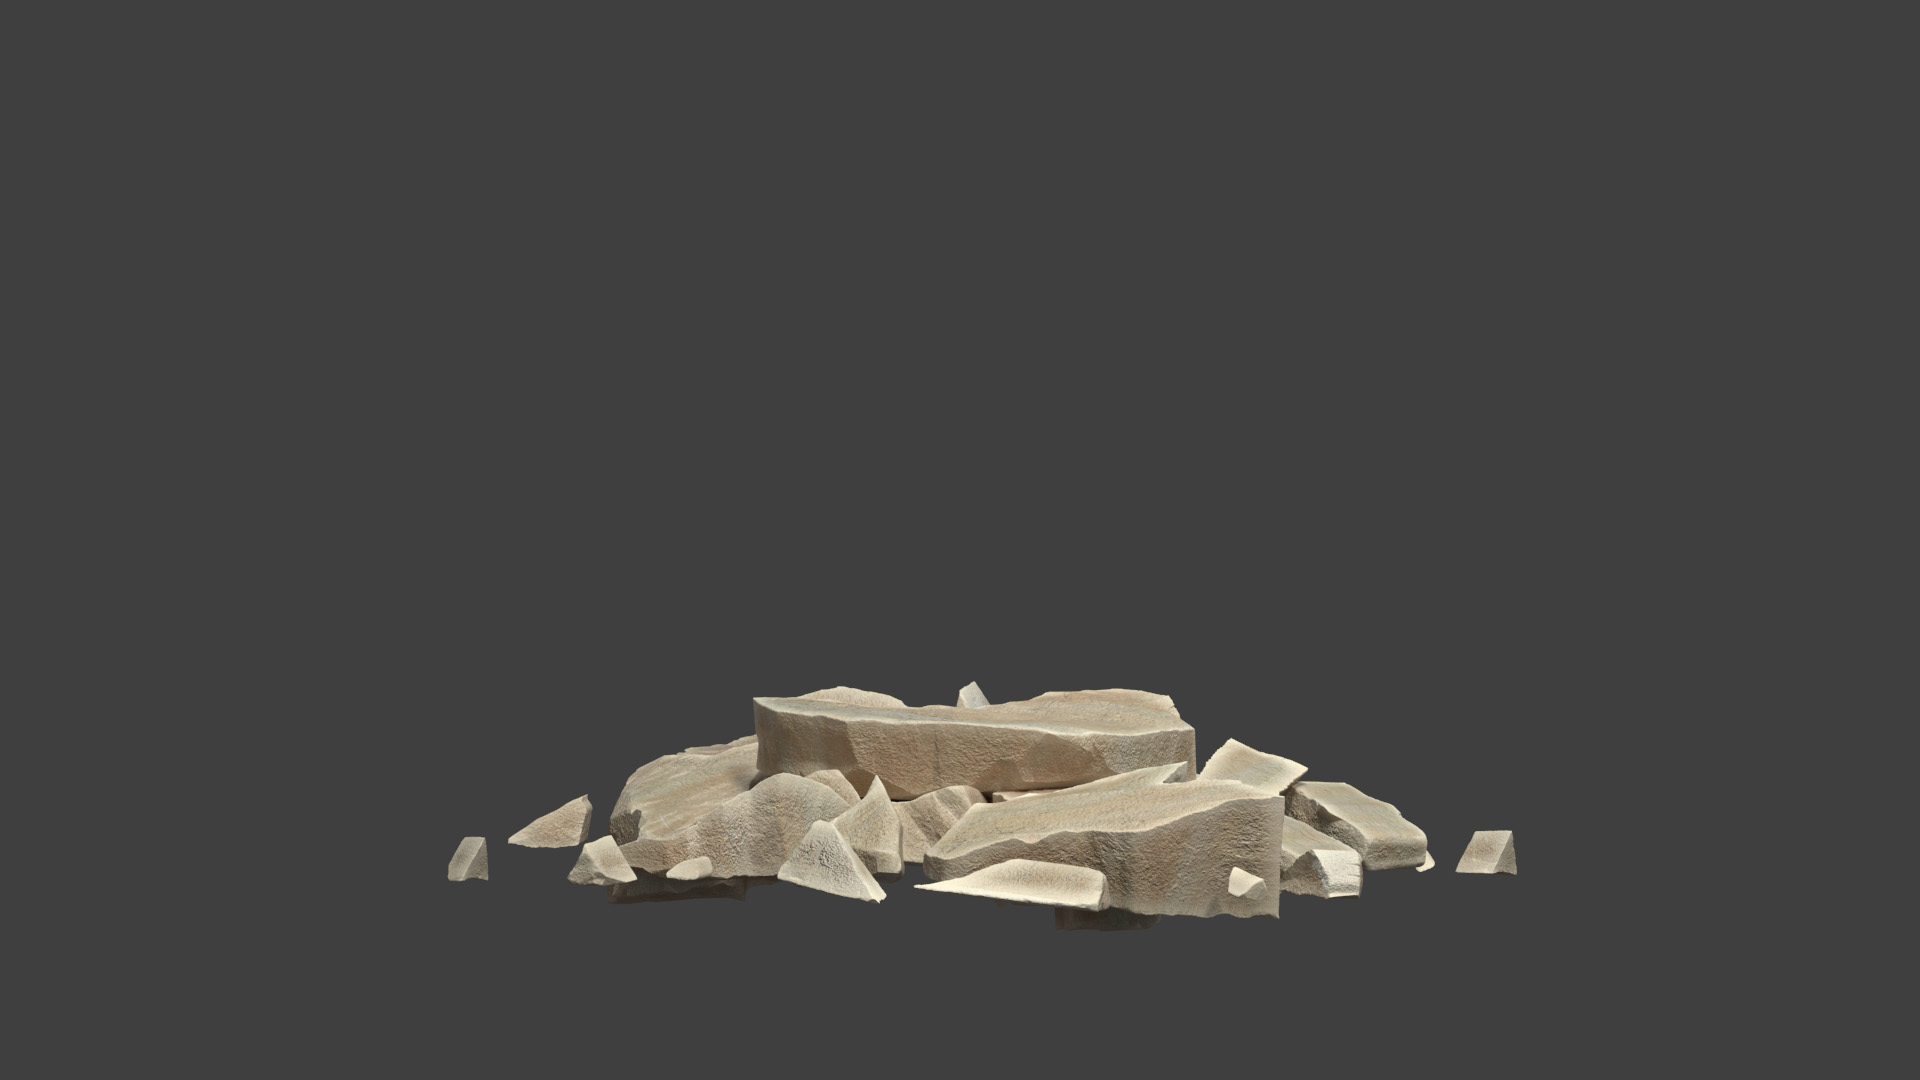 Stone_Pile.jpg